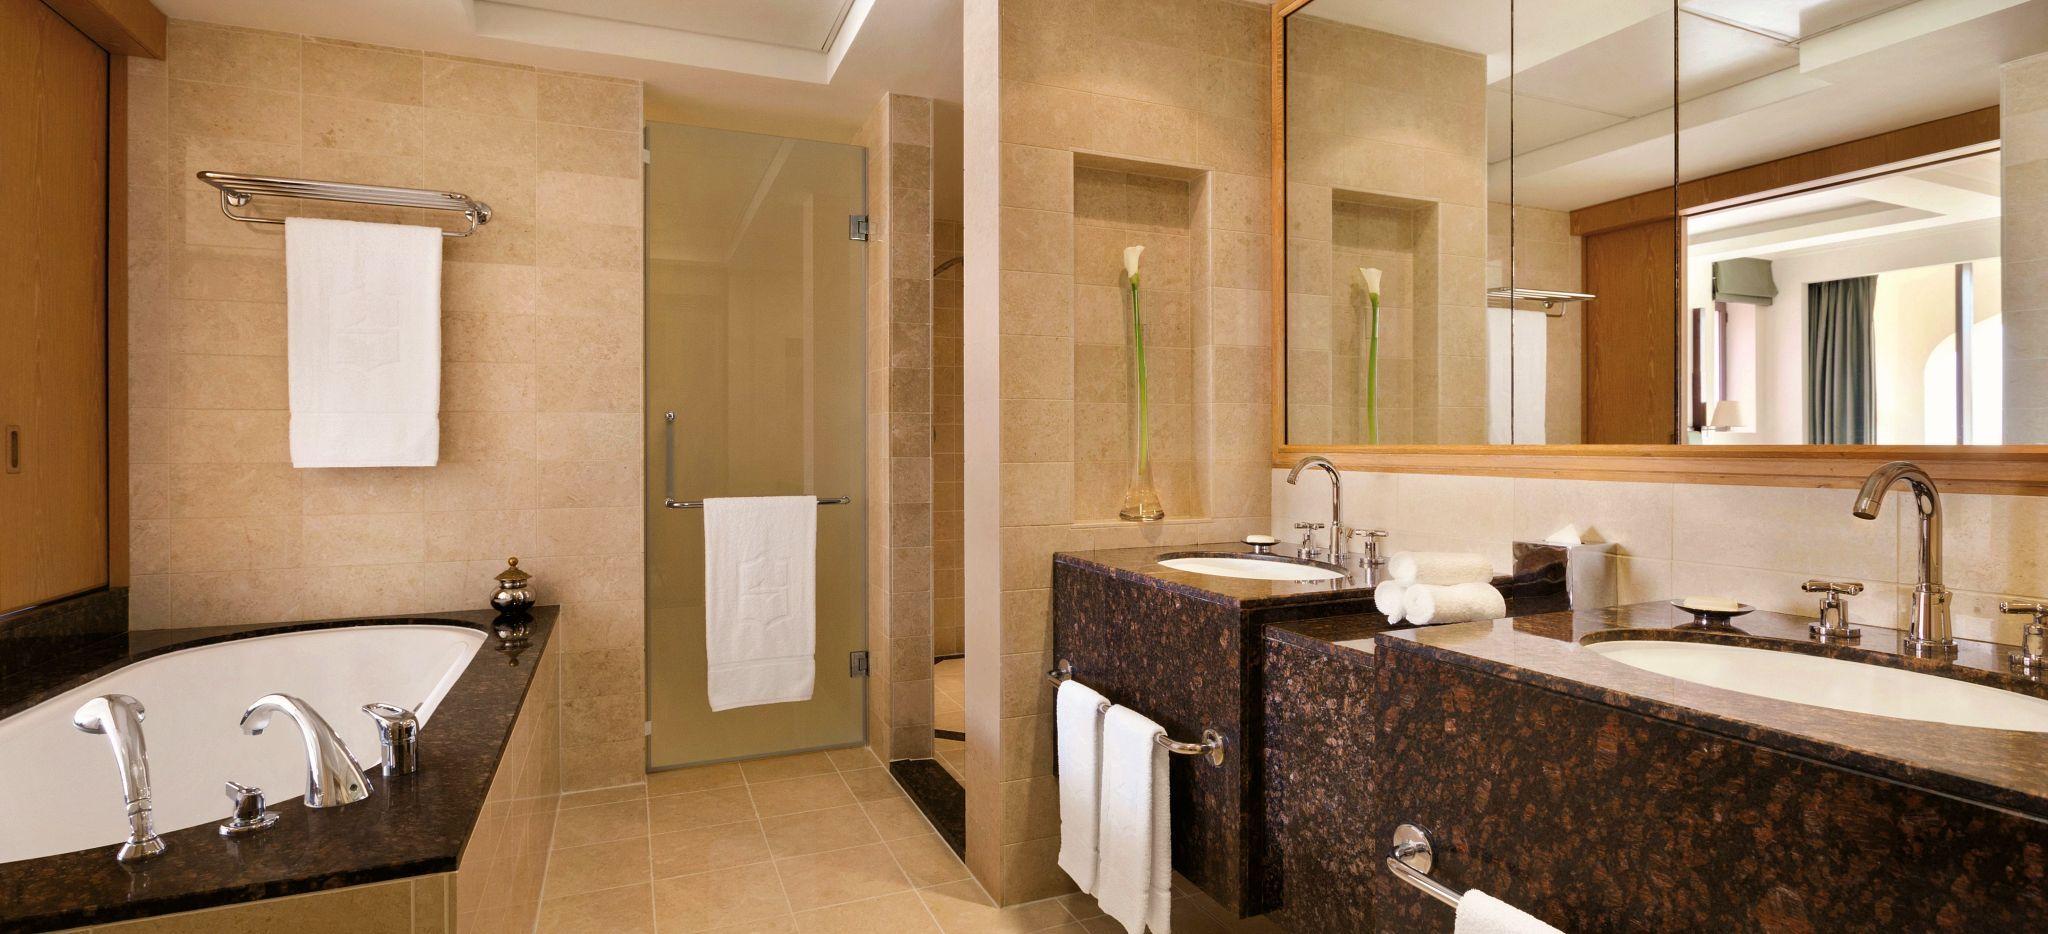 Badezimmer einer One Bedroom Suite im Shangri-La Al Bandar in Maskat, Oman